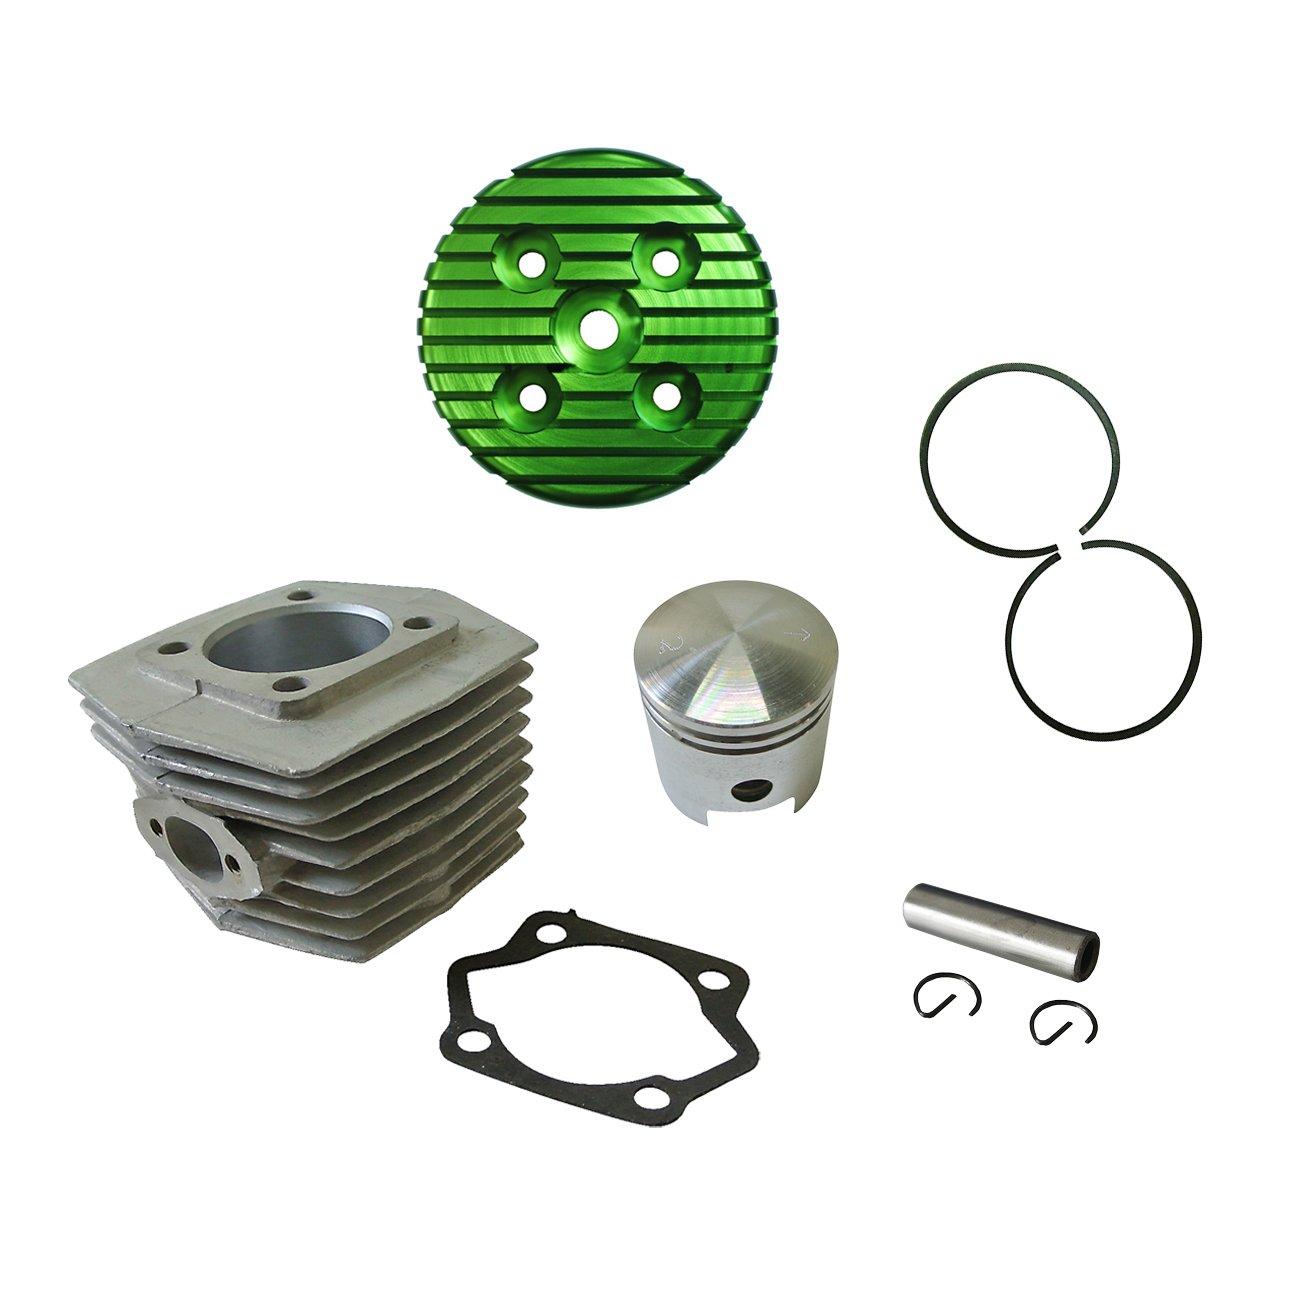 CNC Green Cylinder Head/&Cylinder/&Piston For 80cc Engine Motorised Bike